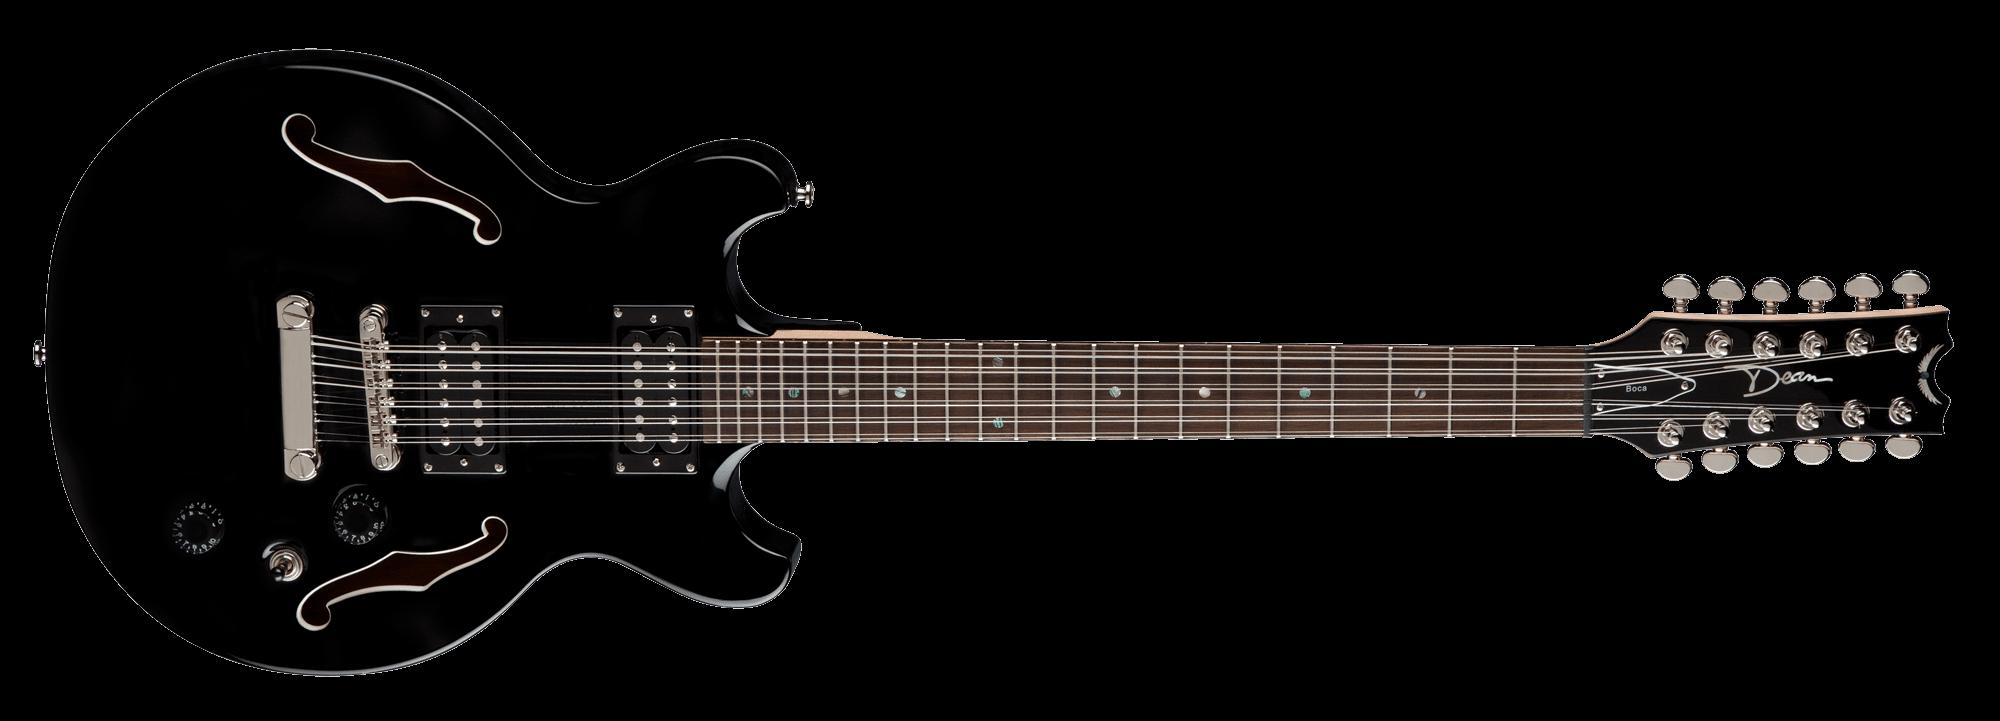 Boca 12 String Classic Black